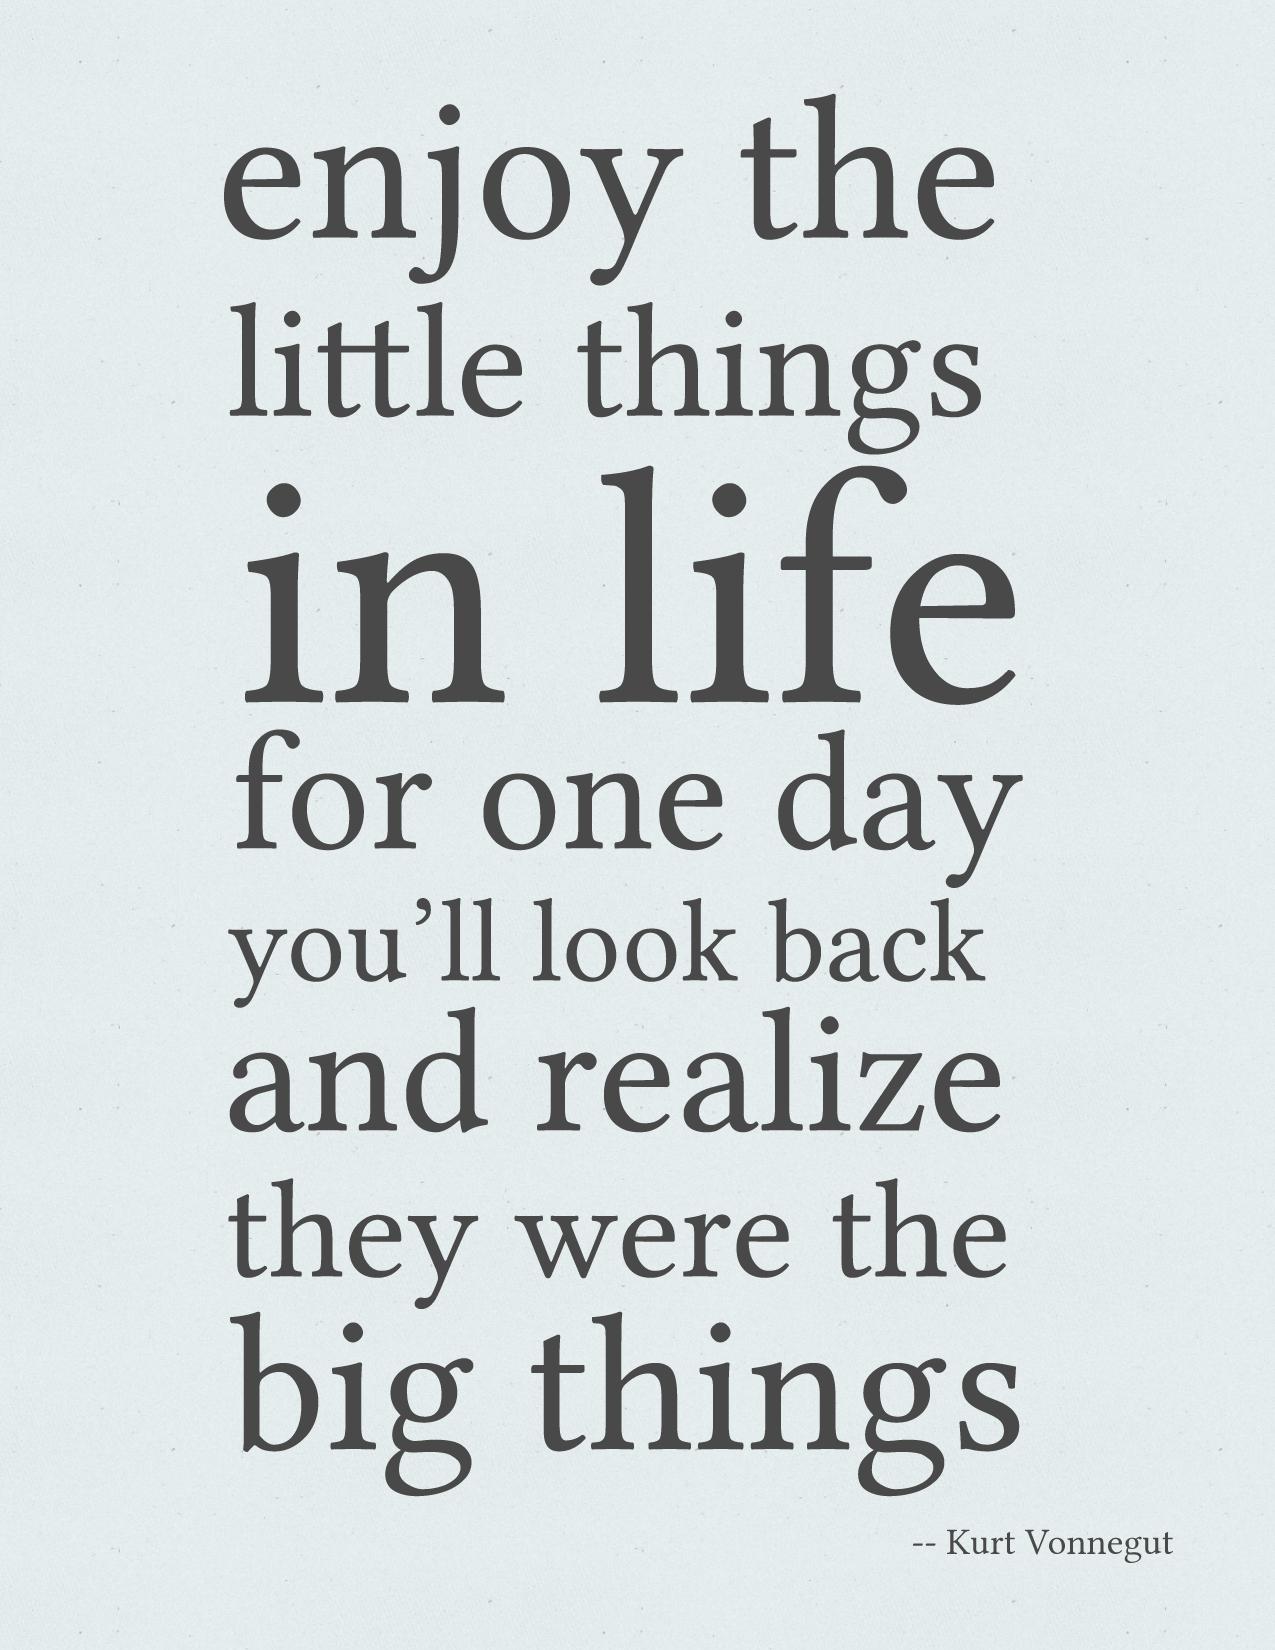 Kurt Vonnegut's quote #1